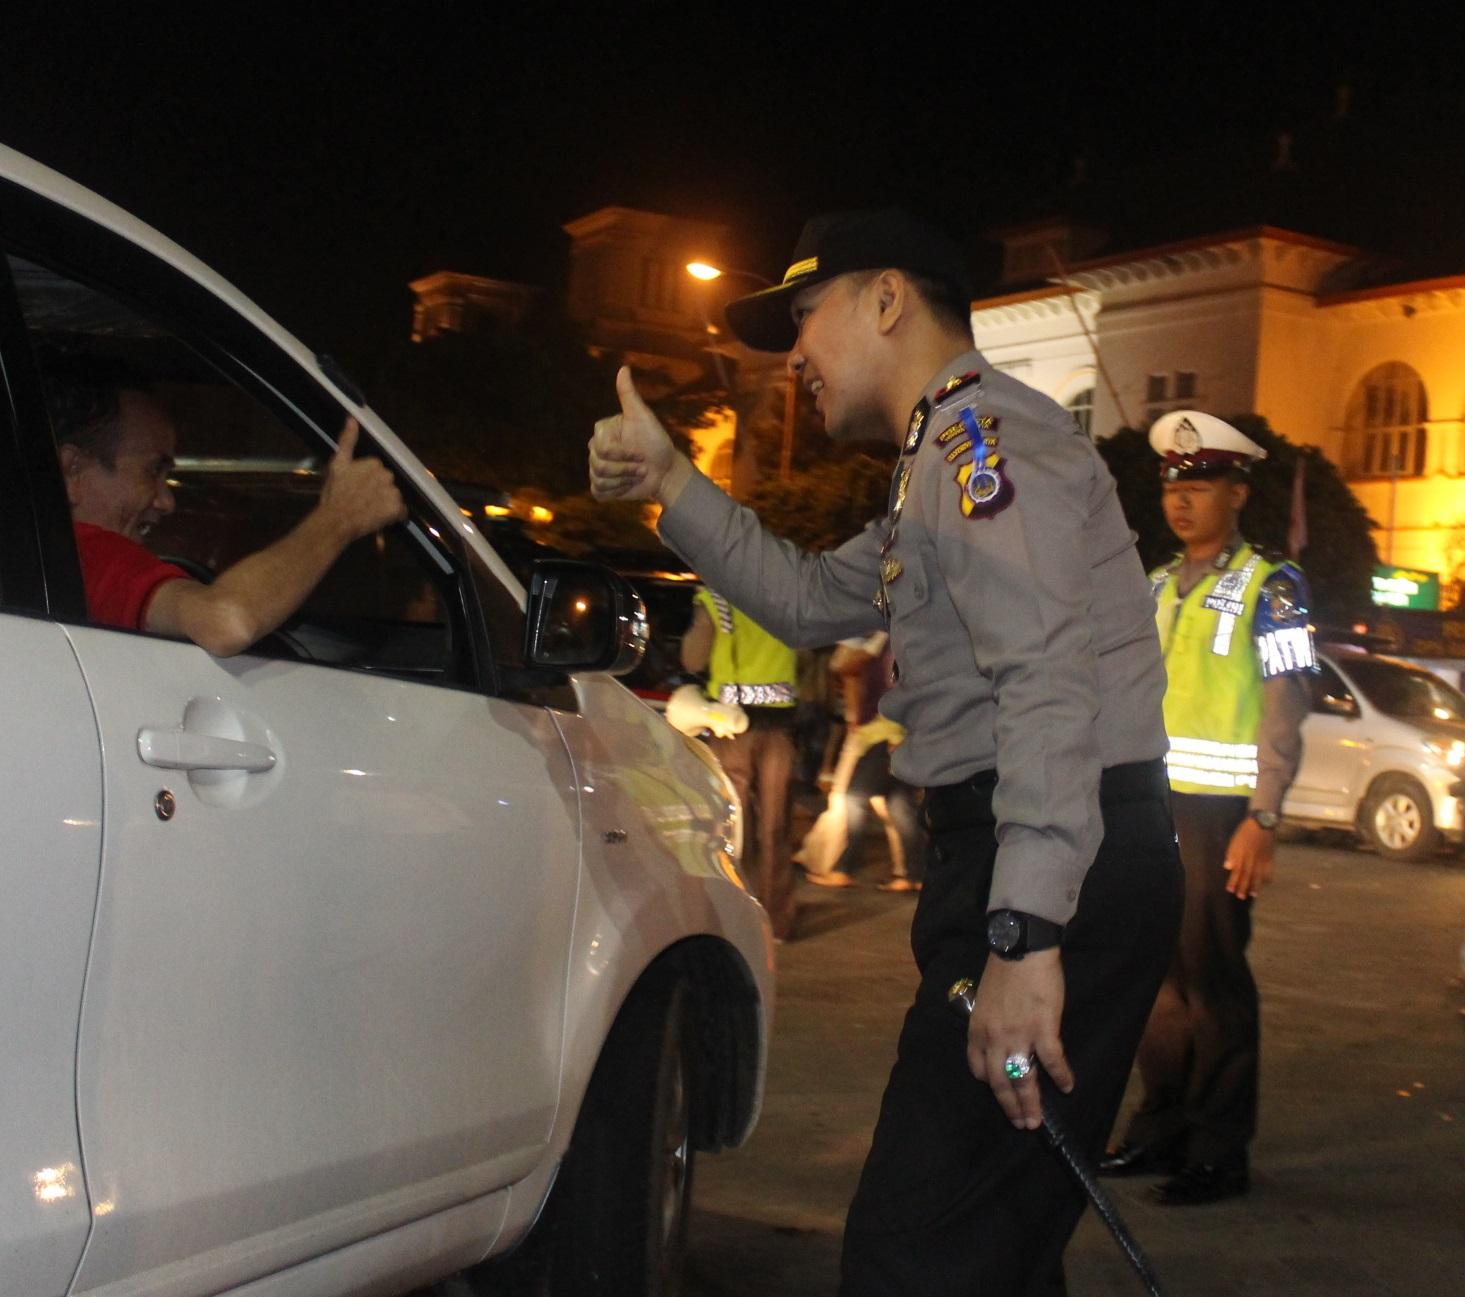 Kapolresta Yogyakarta$quote=Komisaris Besar Polisi Tommy Wibisono, S.Ik